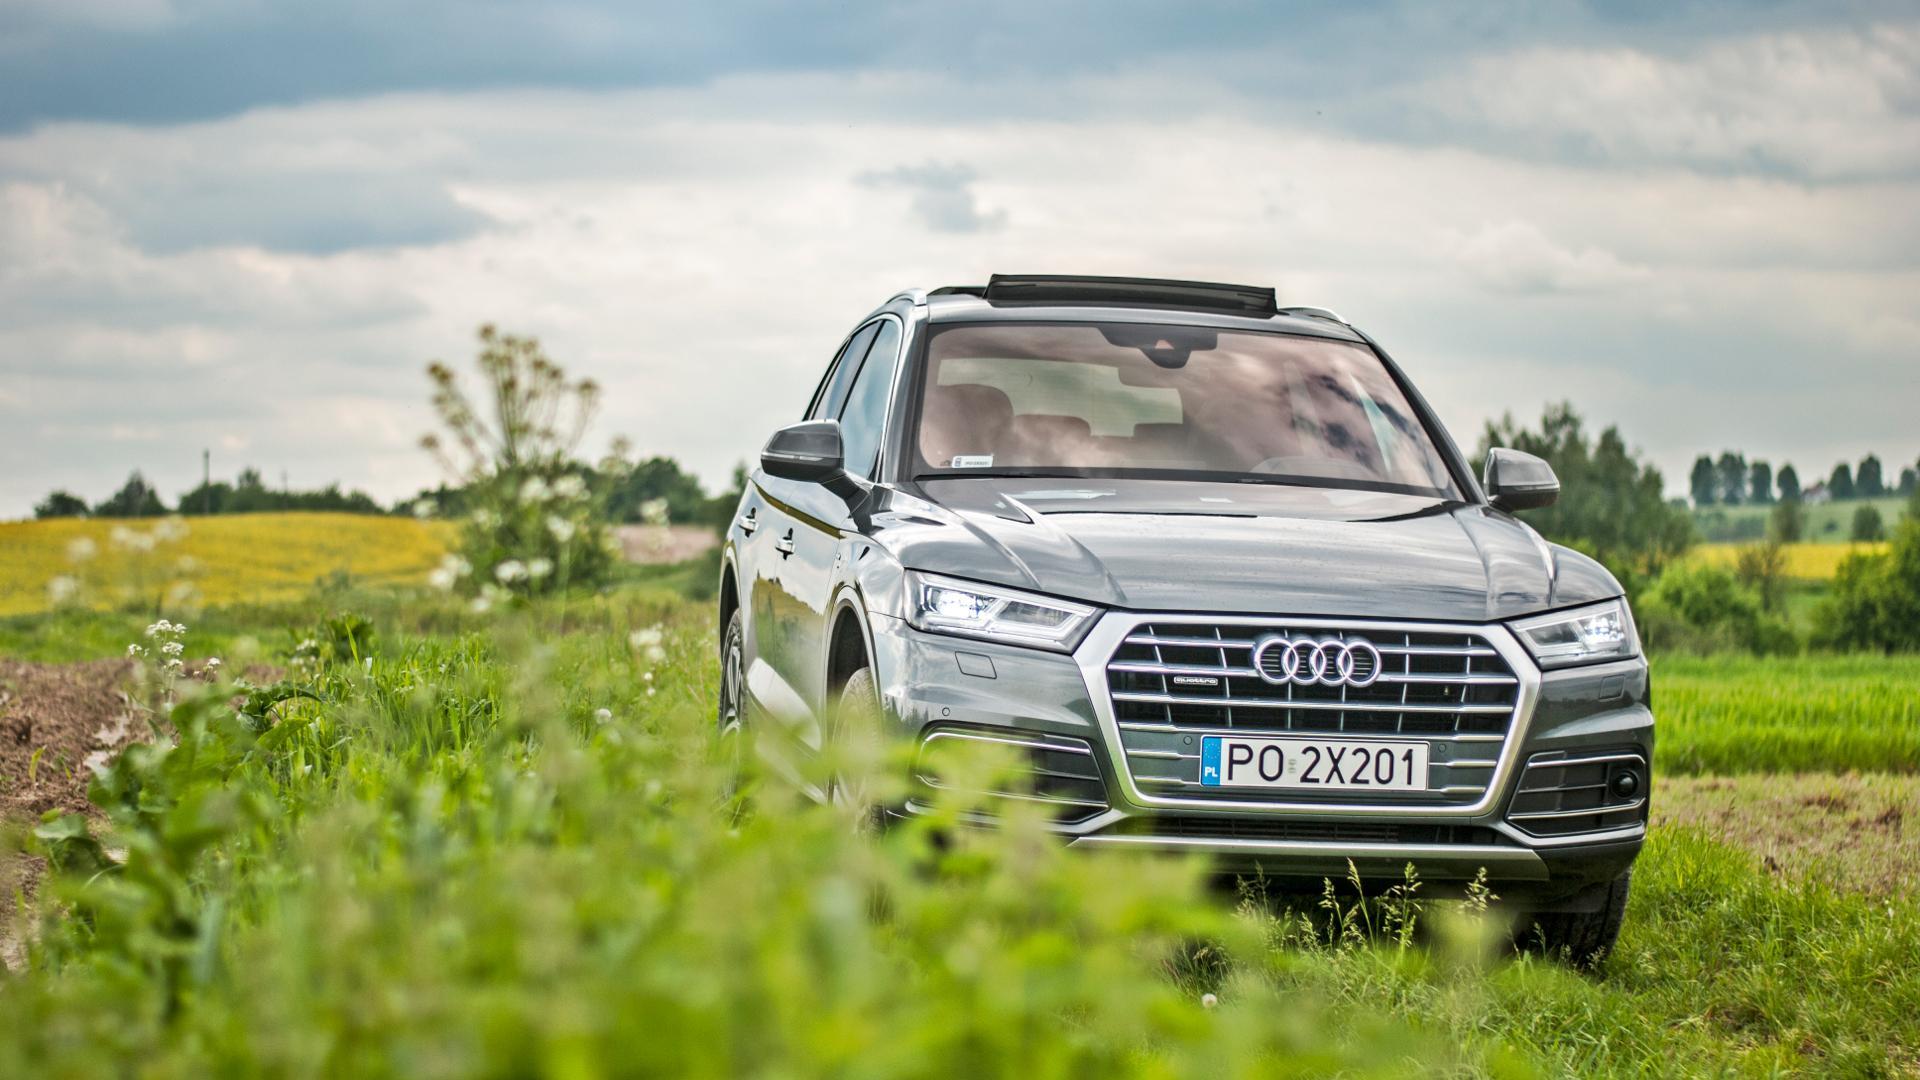 Audi Q5 Modele Dane Silniki Testy Autocentrumpl